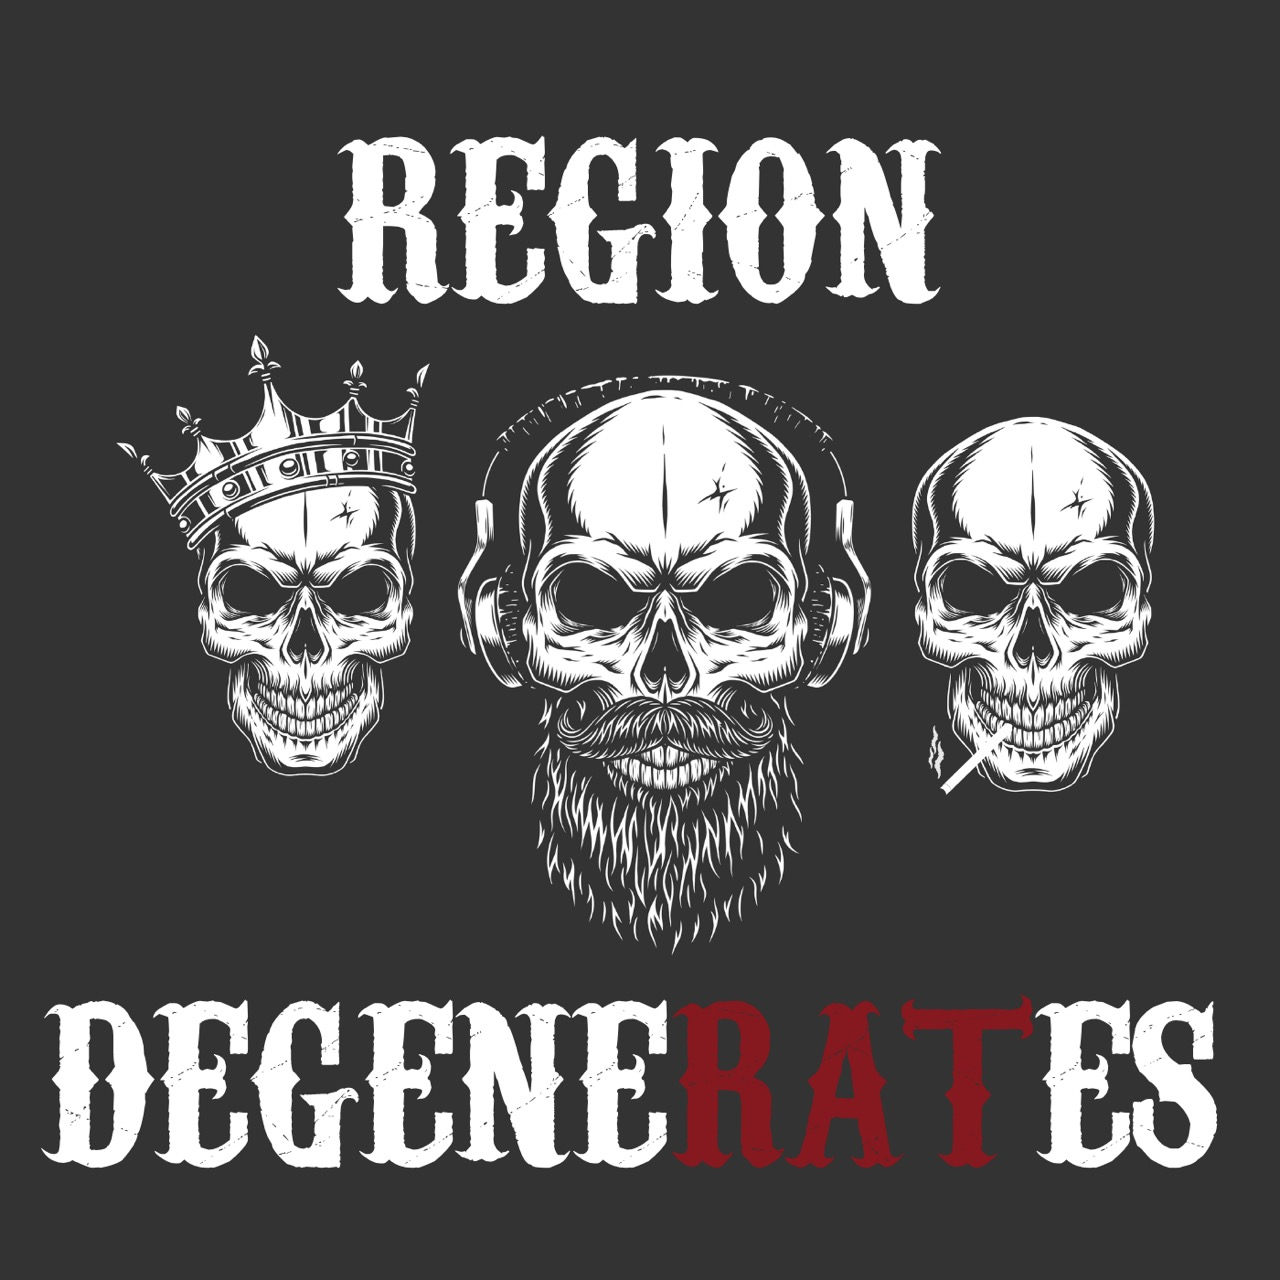 Region Degenerates EP. 1 Kyle Gagliardi show art